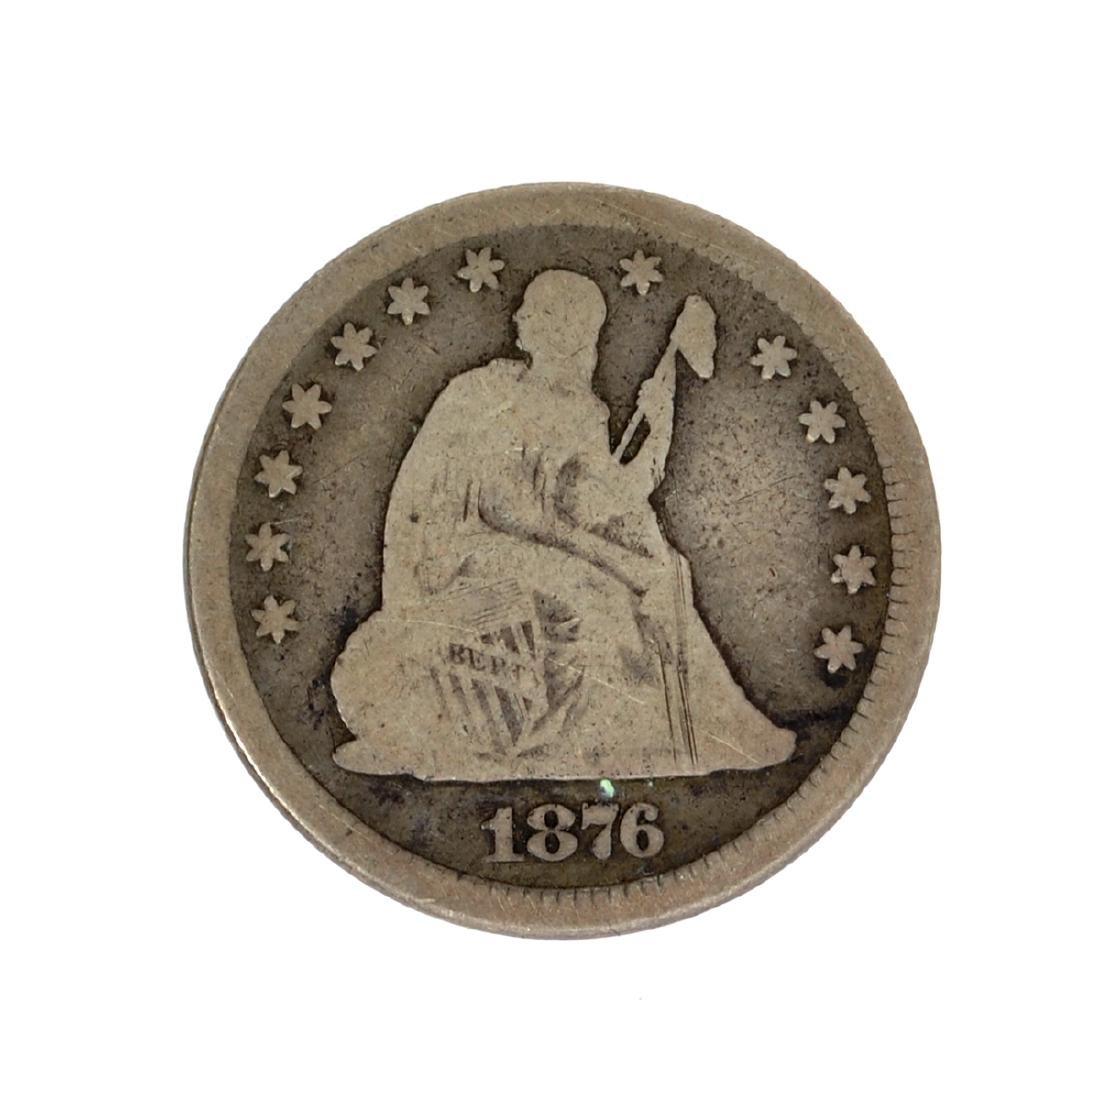 1876 Liberty Seated Quarter Dollar Coin